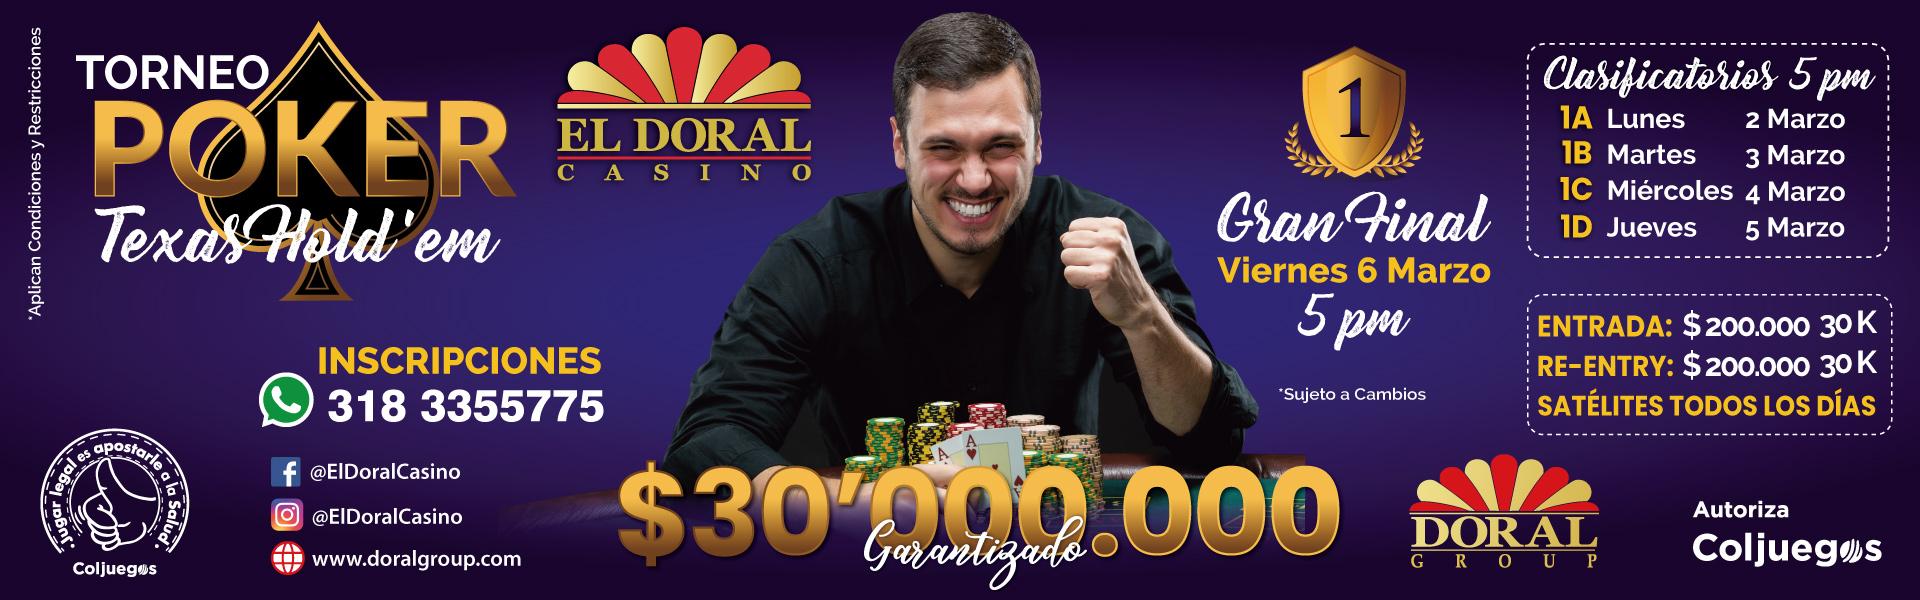 torneo poker texas hold'em, el doral casino